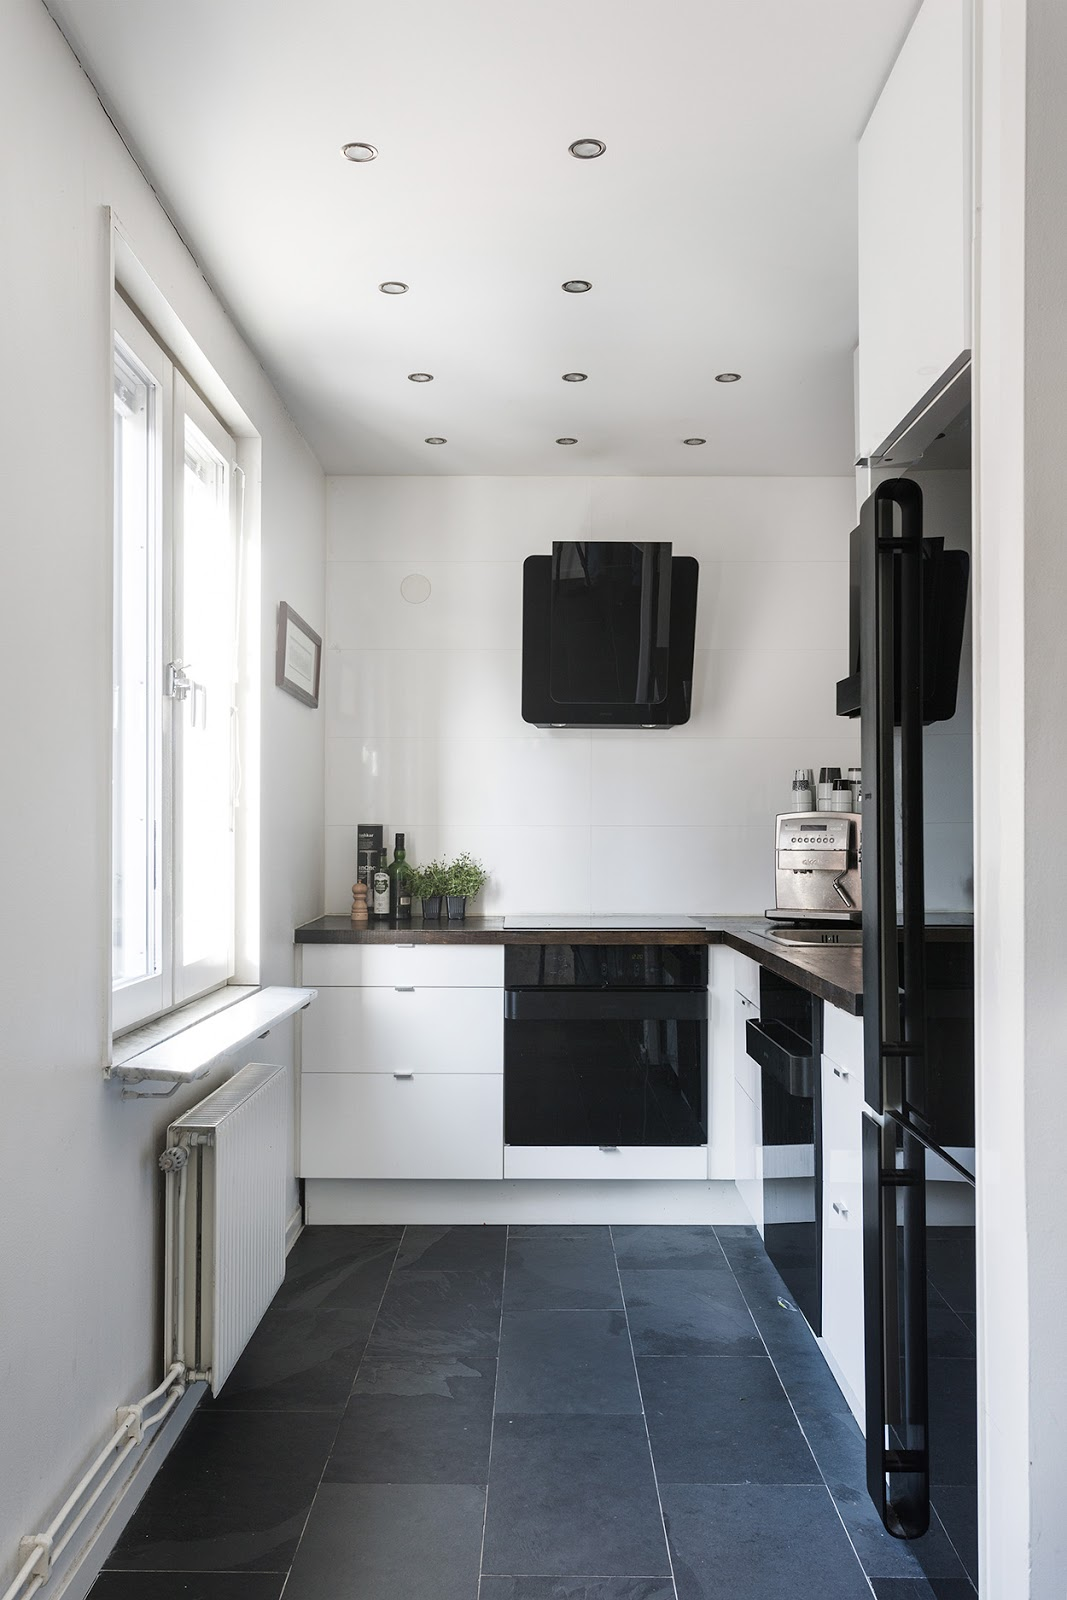 Nordic blends mini appartement in vasastan - Mini appartement ...